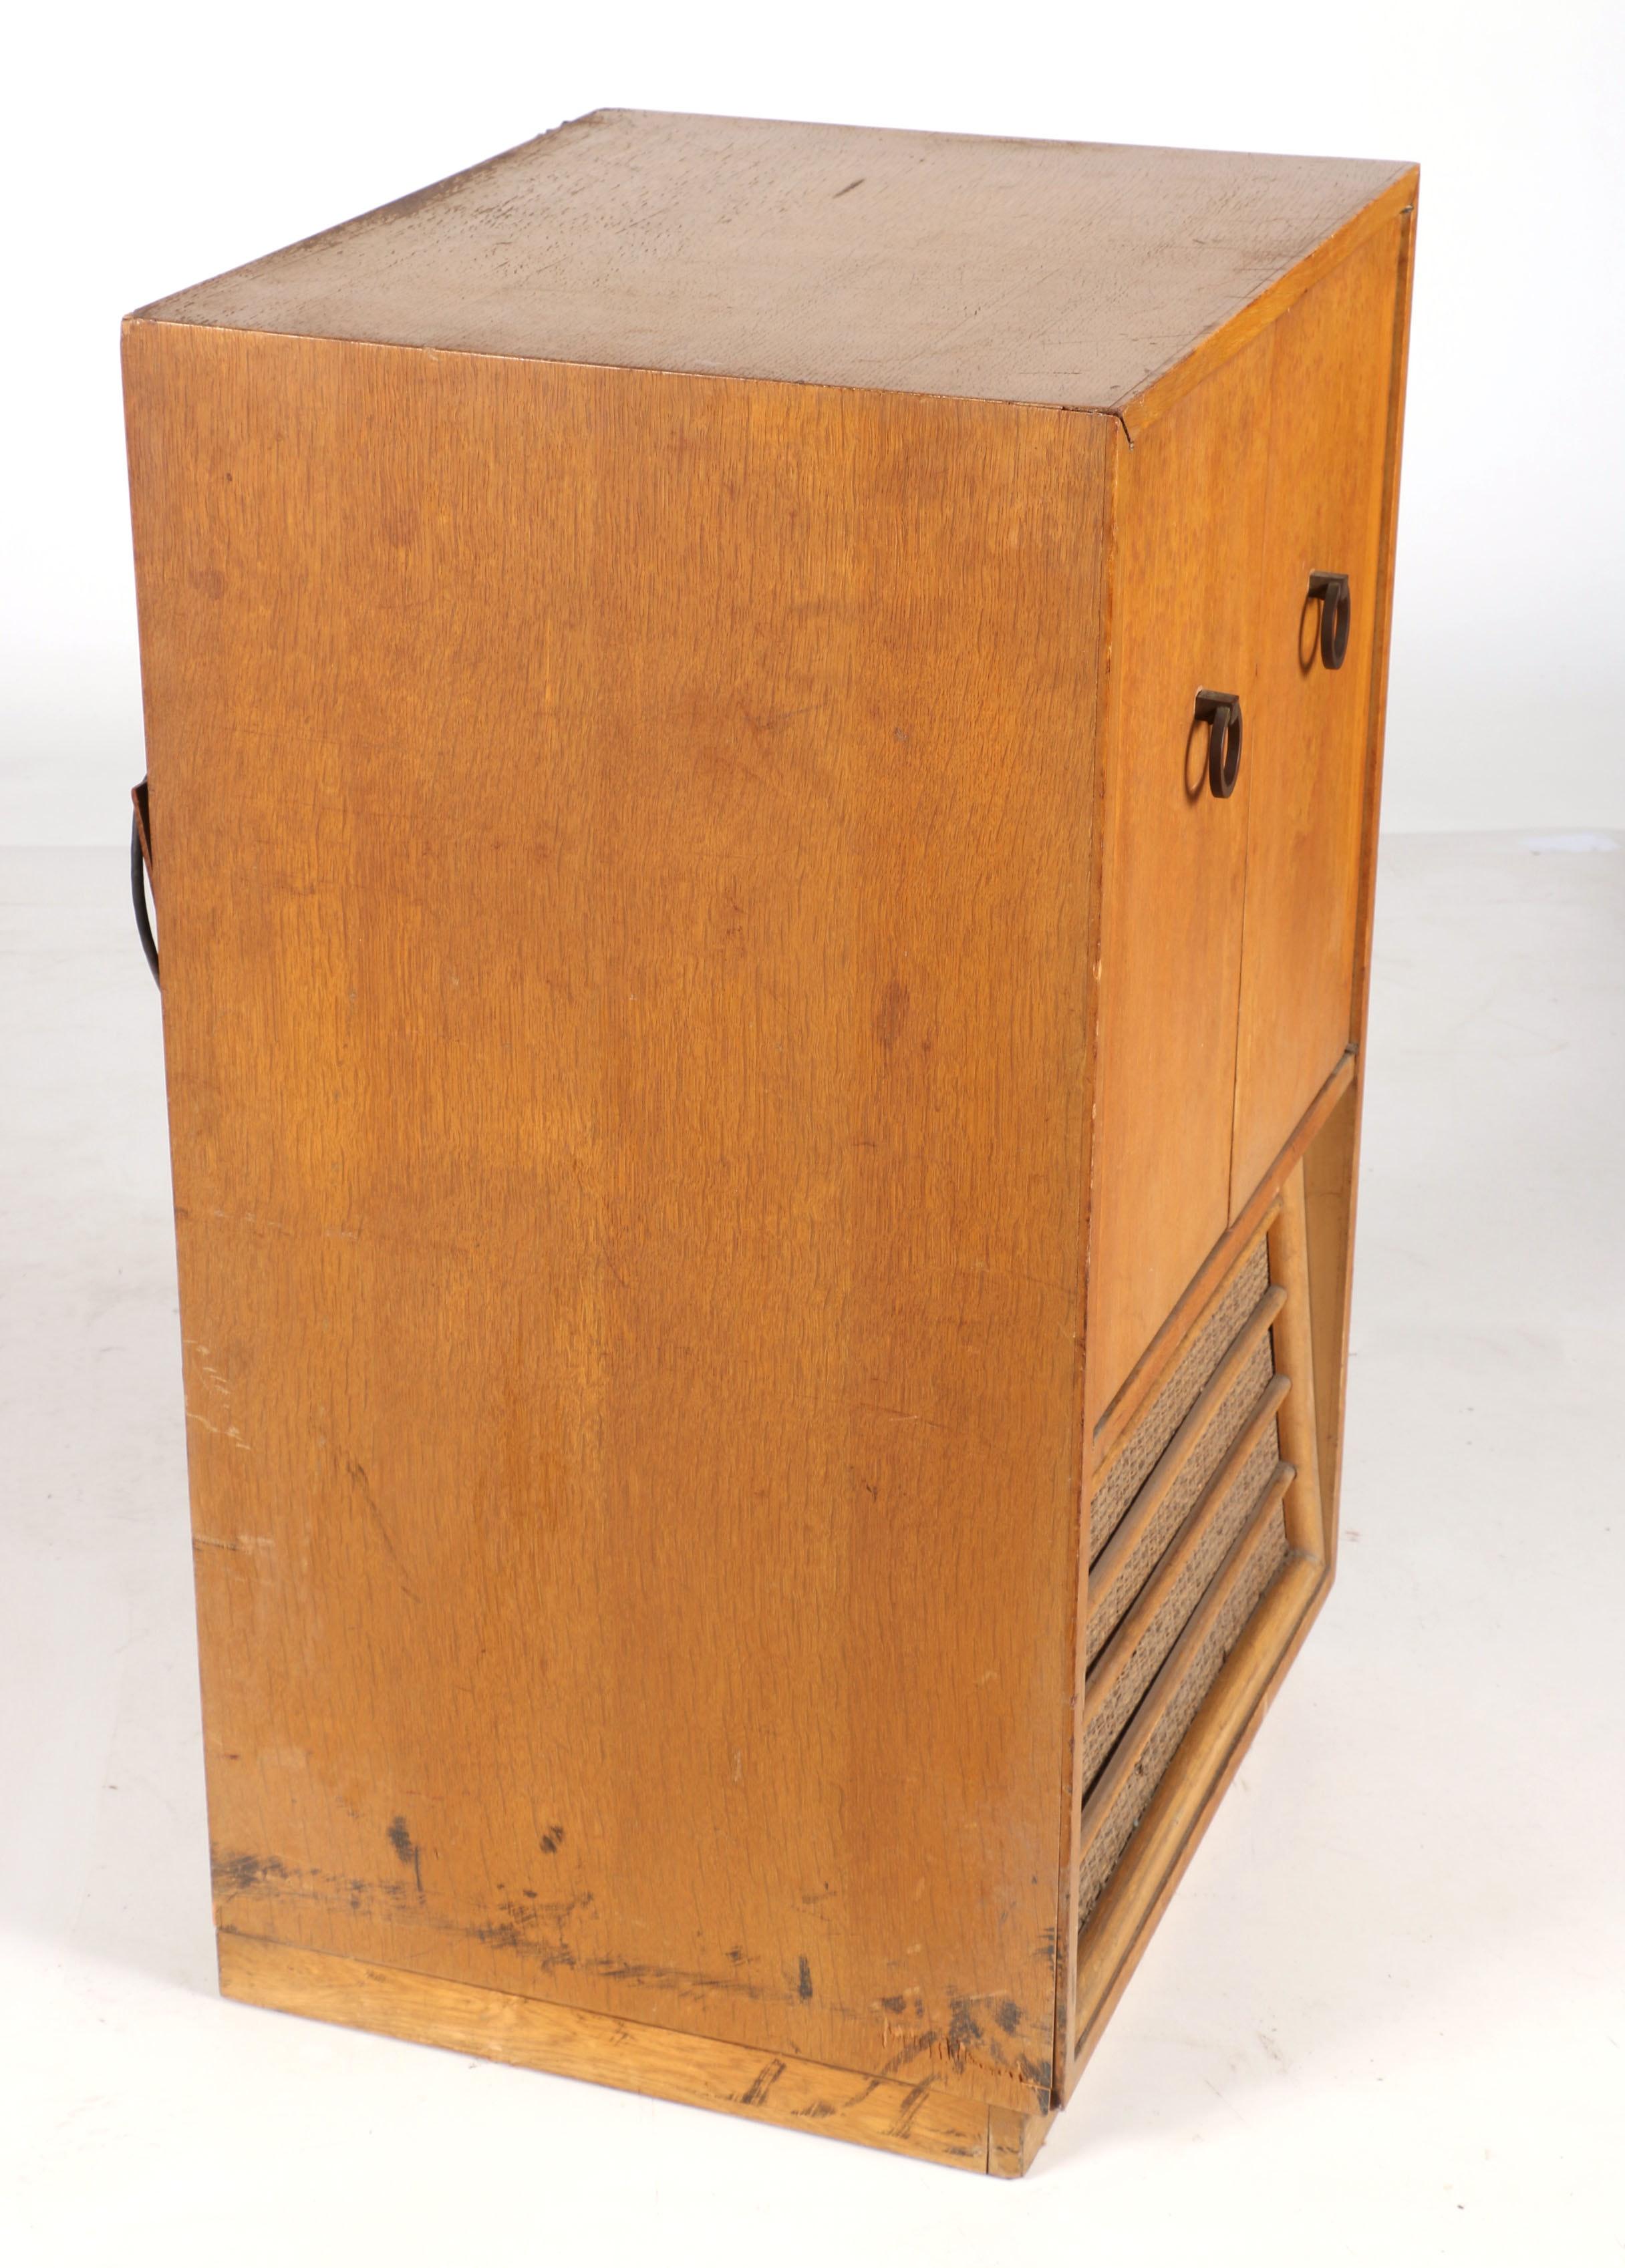 Vintage Stromberg Carlson Radio With Speaker Ebth